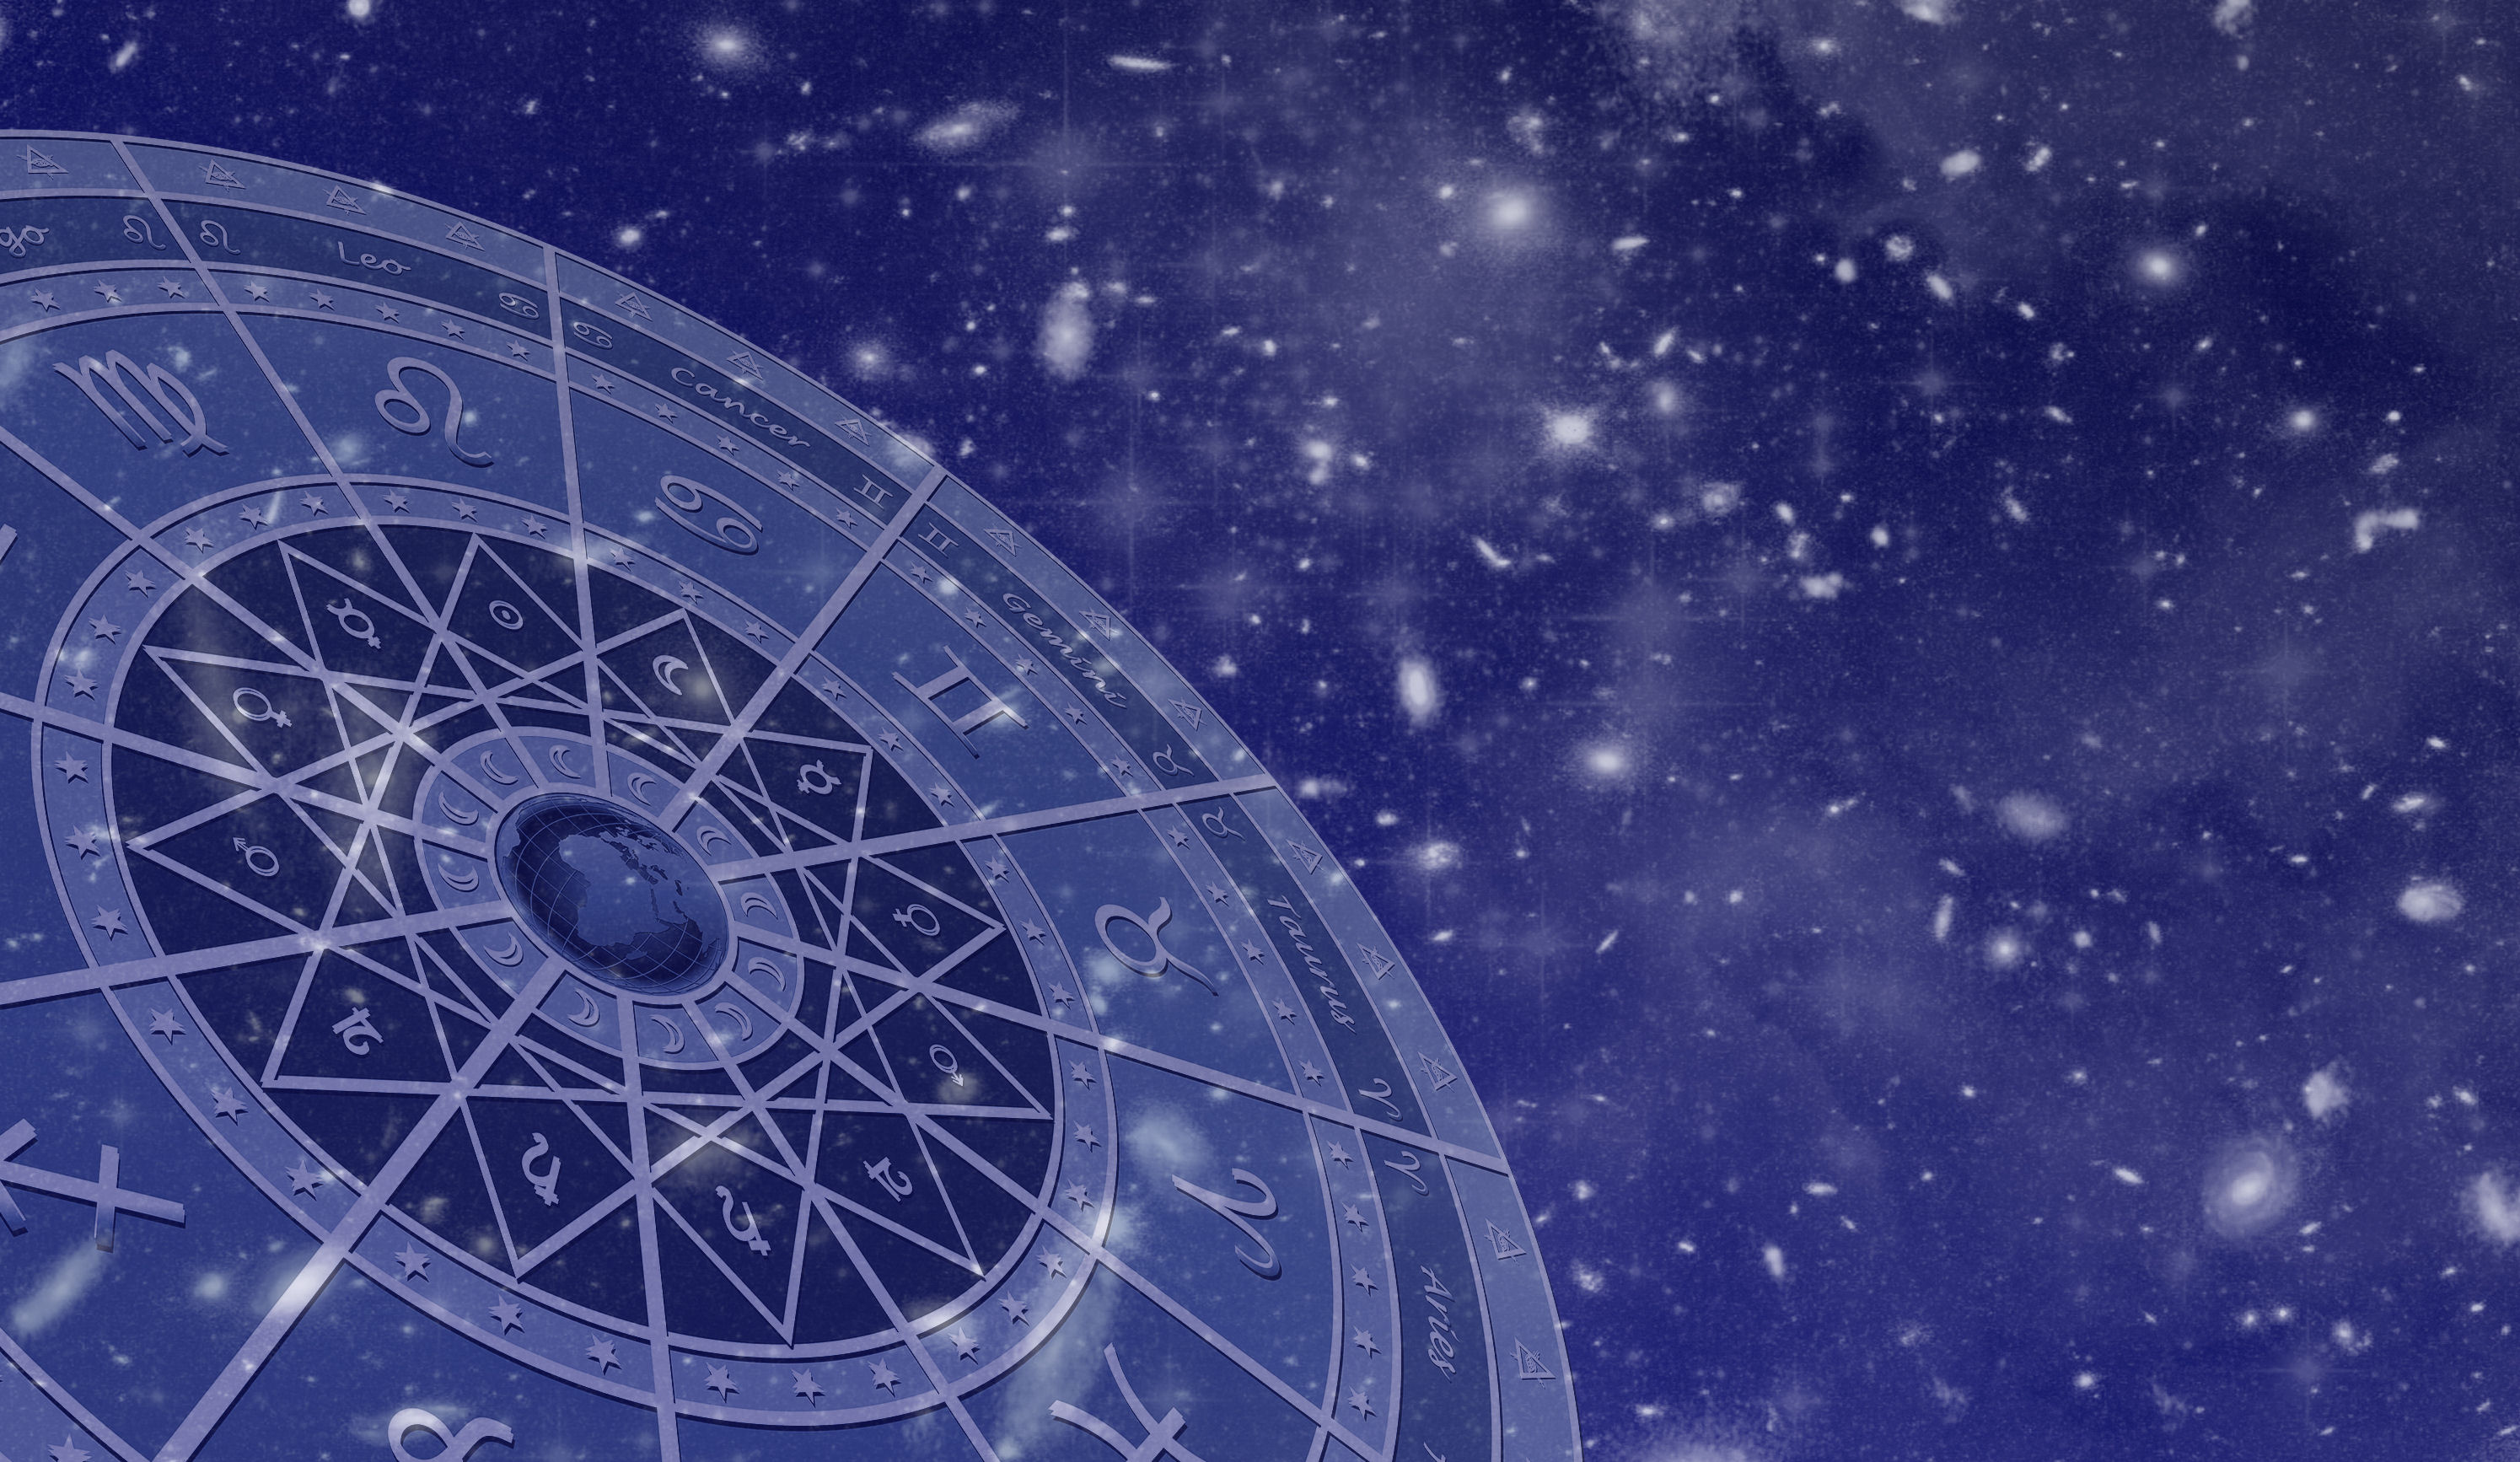 Stars, 2018, horoscope, Sun Sign, Future, New Year, Lifestyle, NewsMobile, Mobile News, India